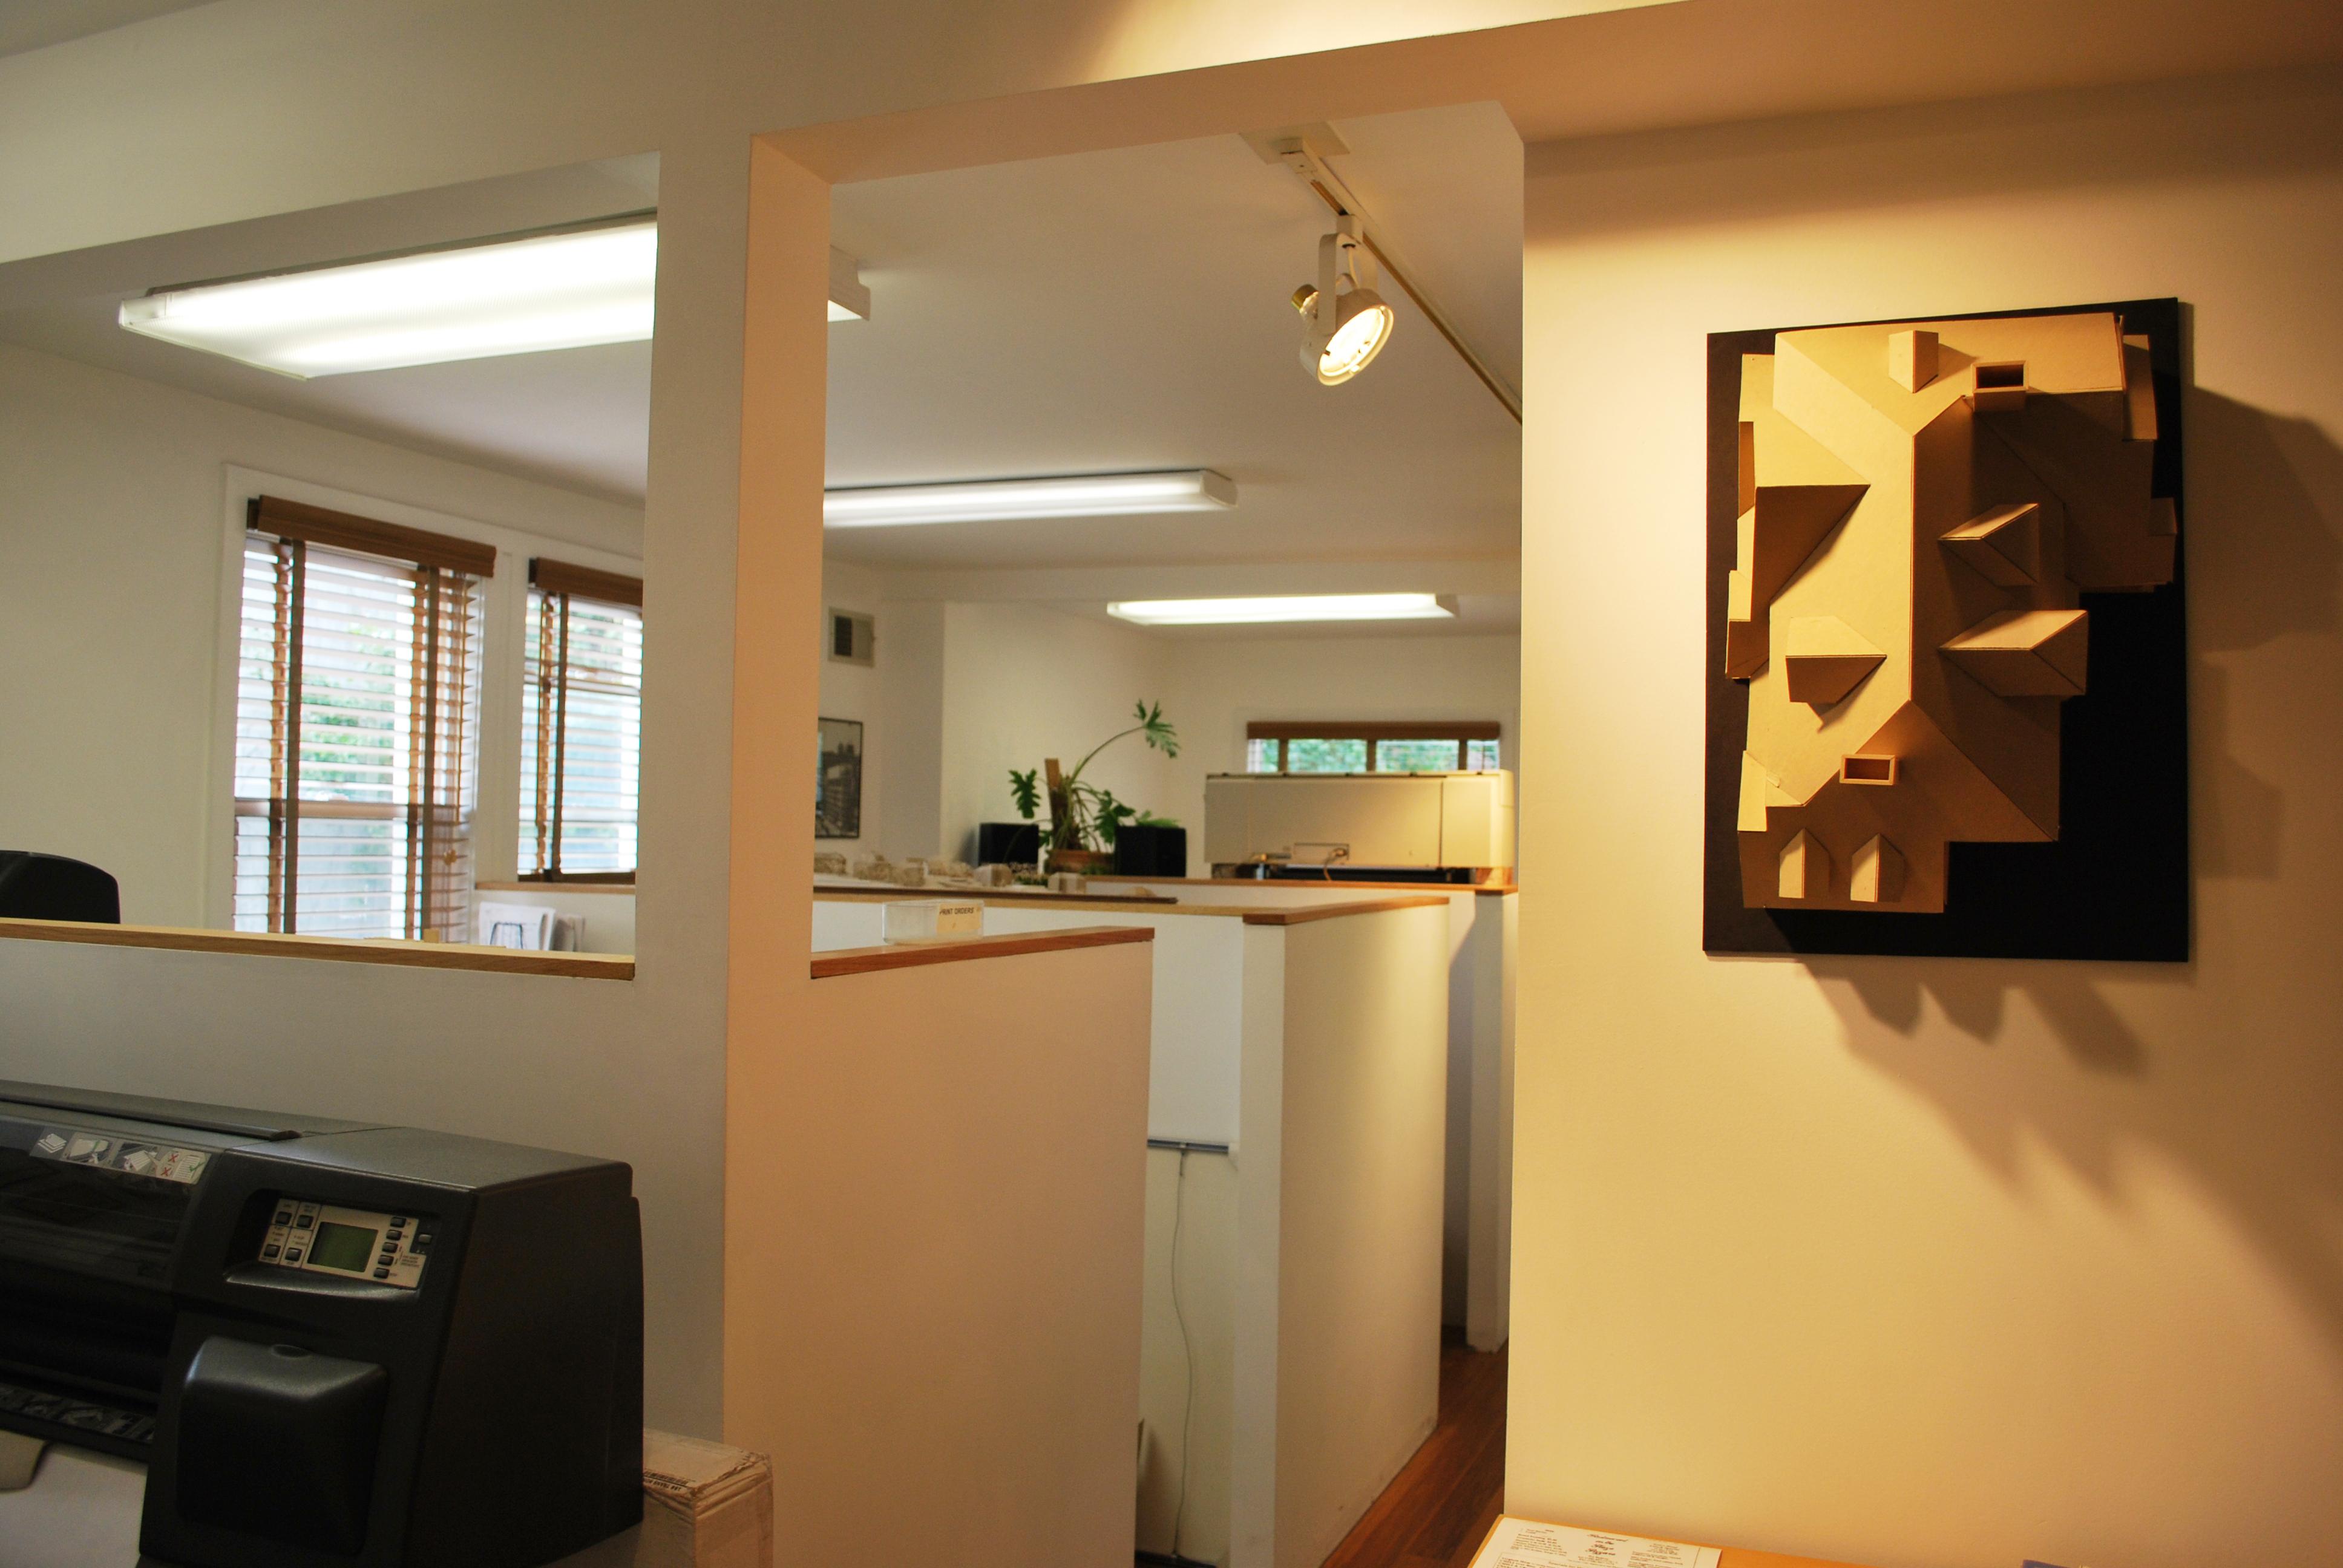 Sunrise Kitchen Cabinets Office Interior Photo 2 Joseph M Morace A I A Architect